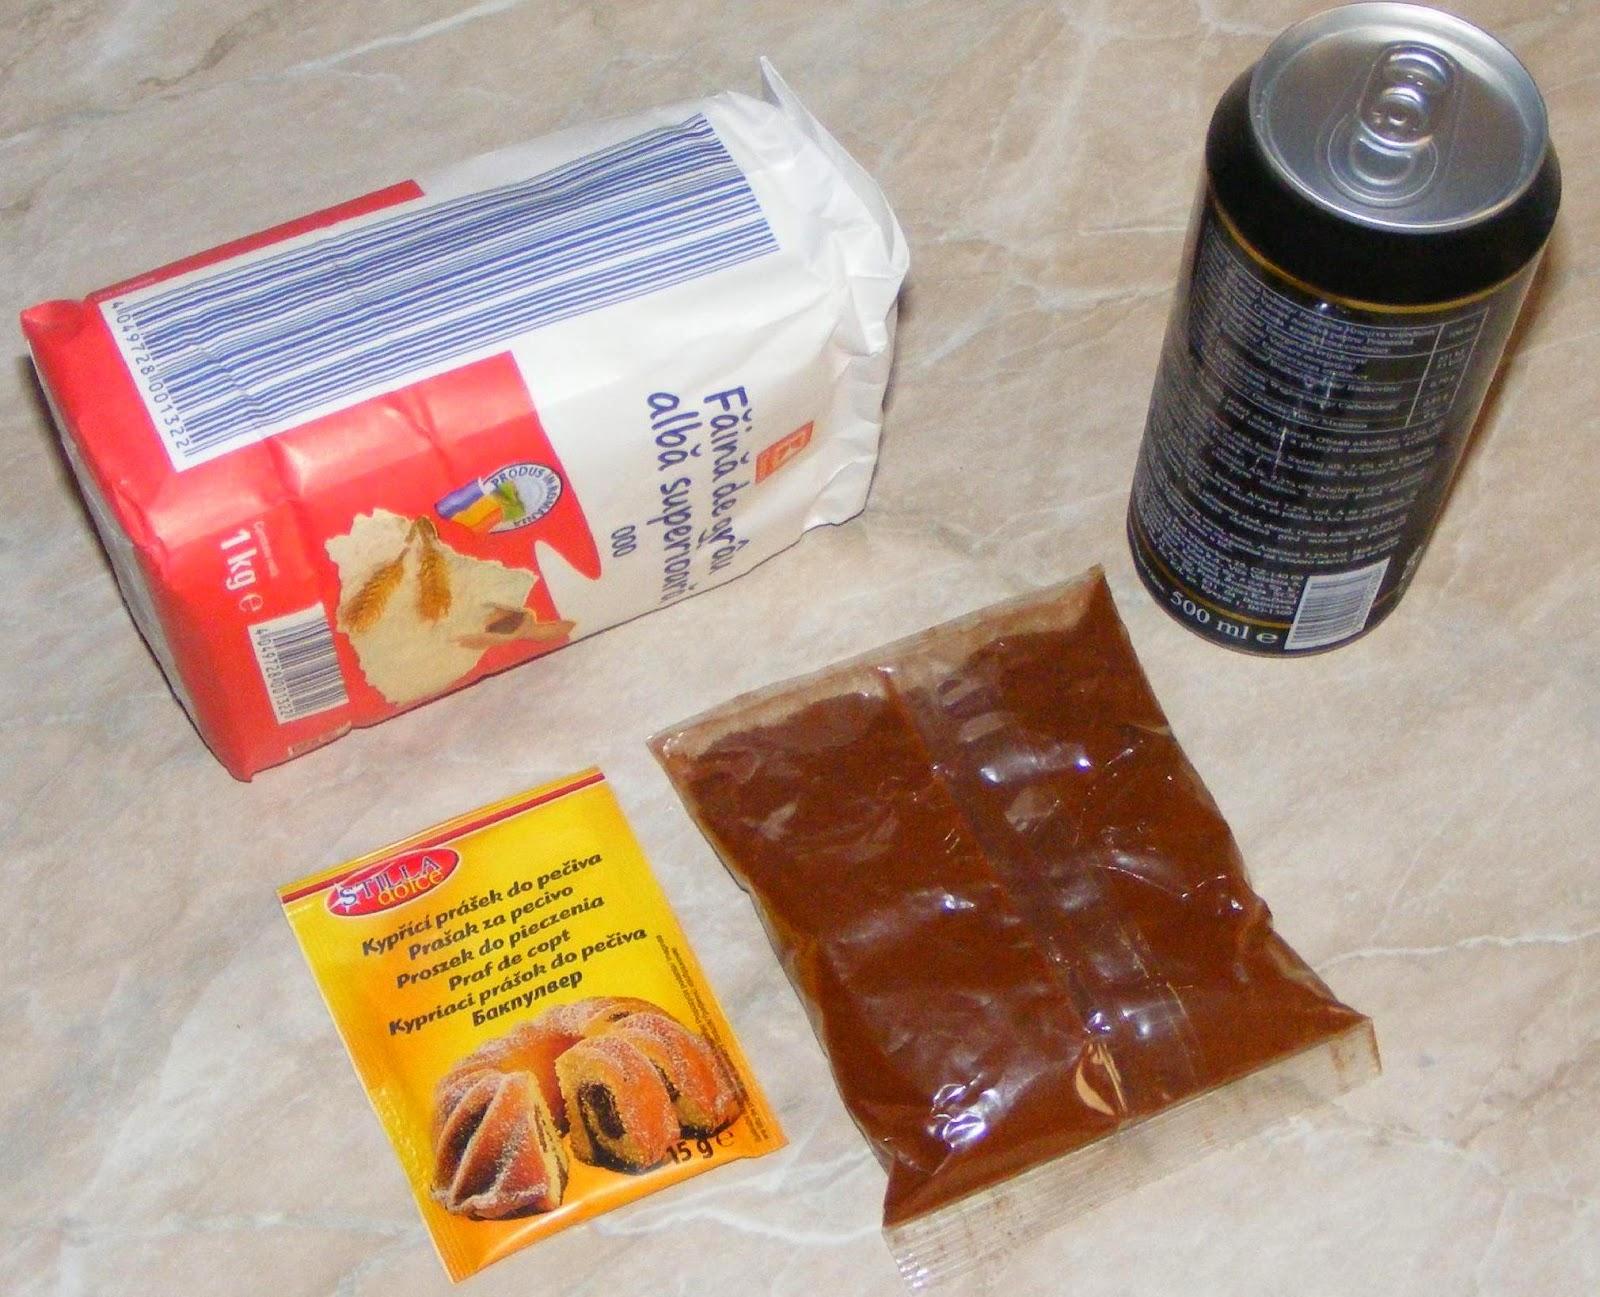 ingrediente pentru hamsie pane, ingrediente pentru peste pane, retete si preparate culinare peste hamsii pane, reteta hamsii pane picant, ingrediente aluat pane,